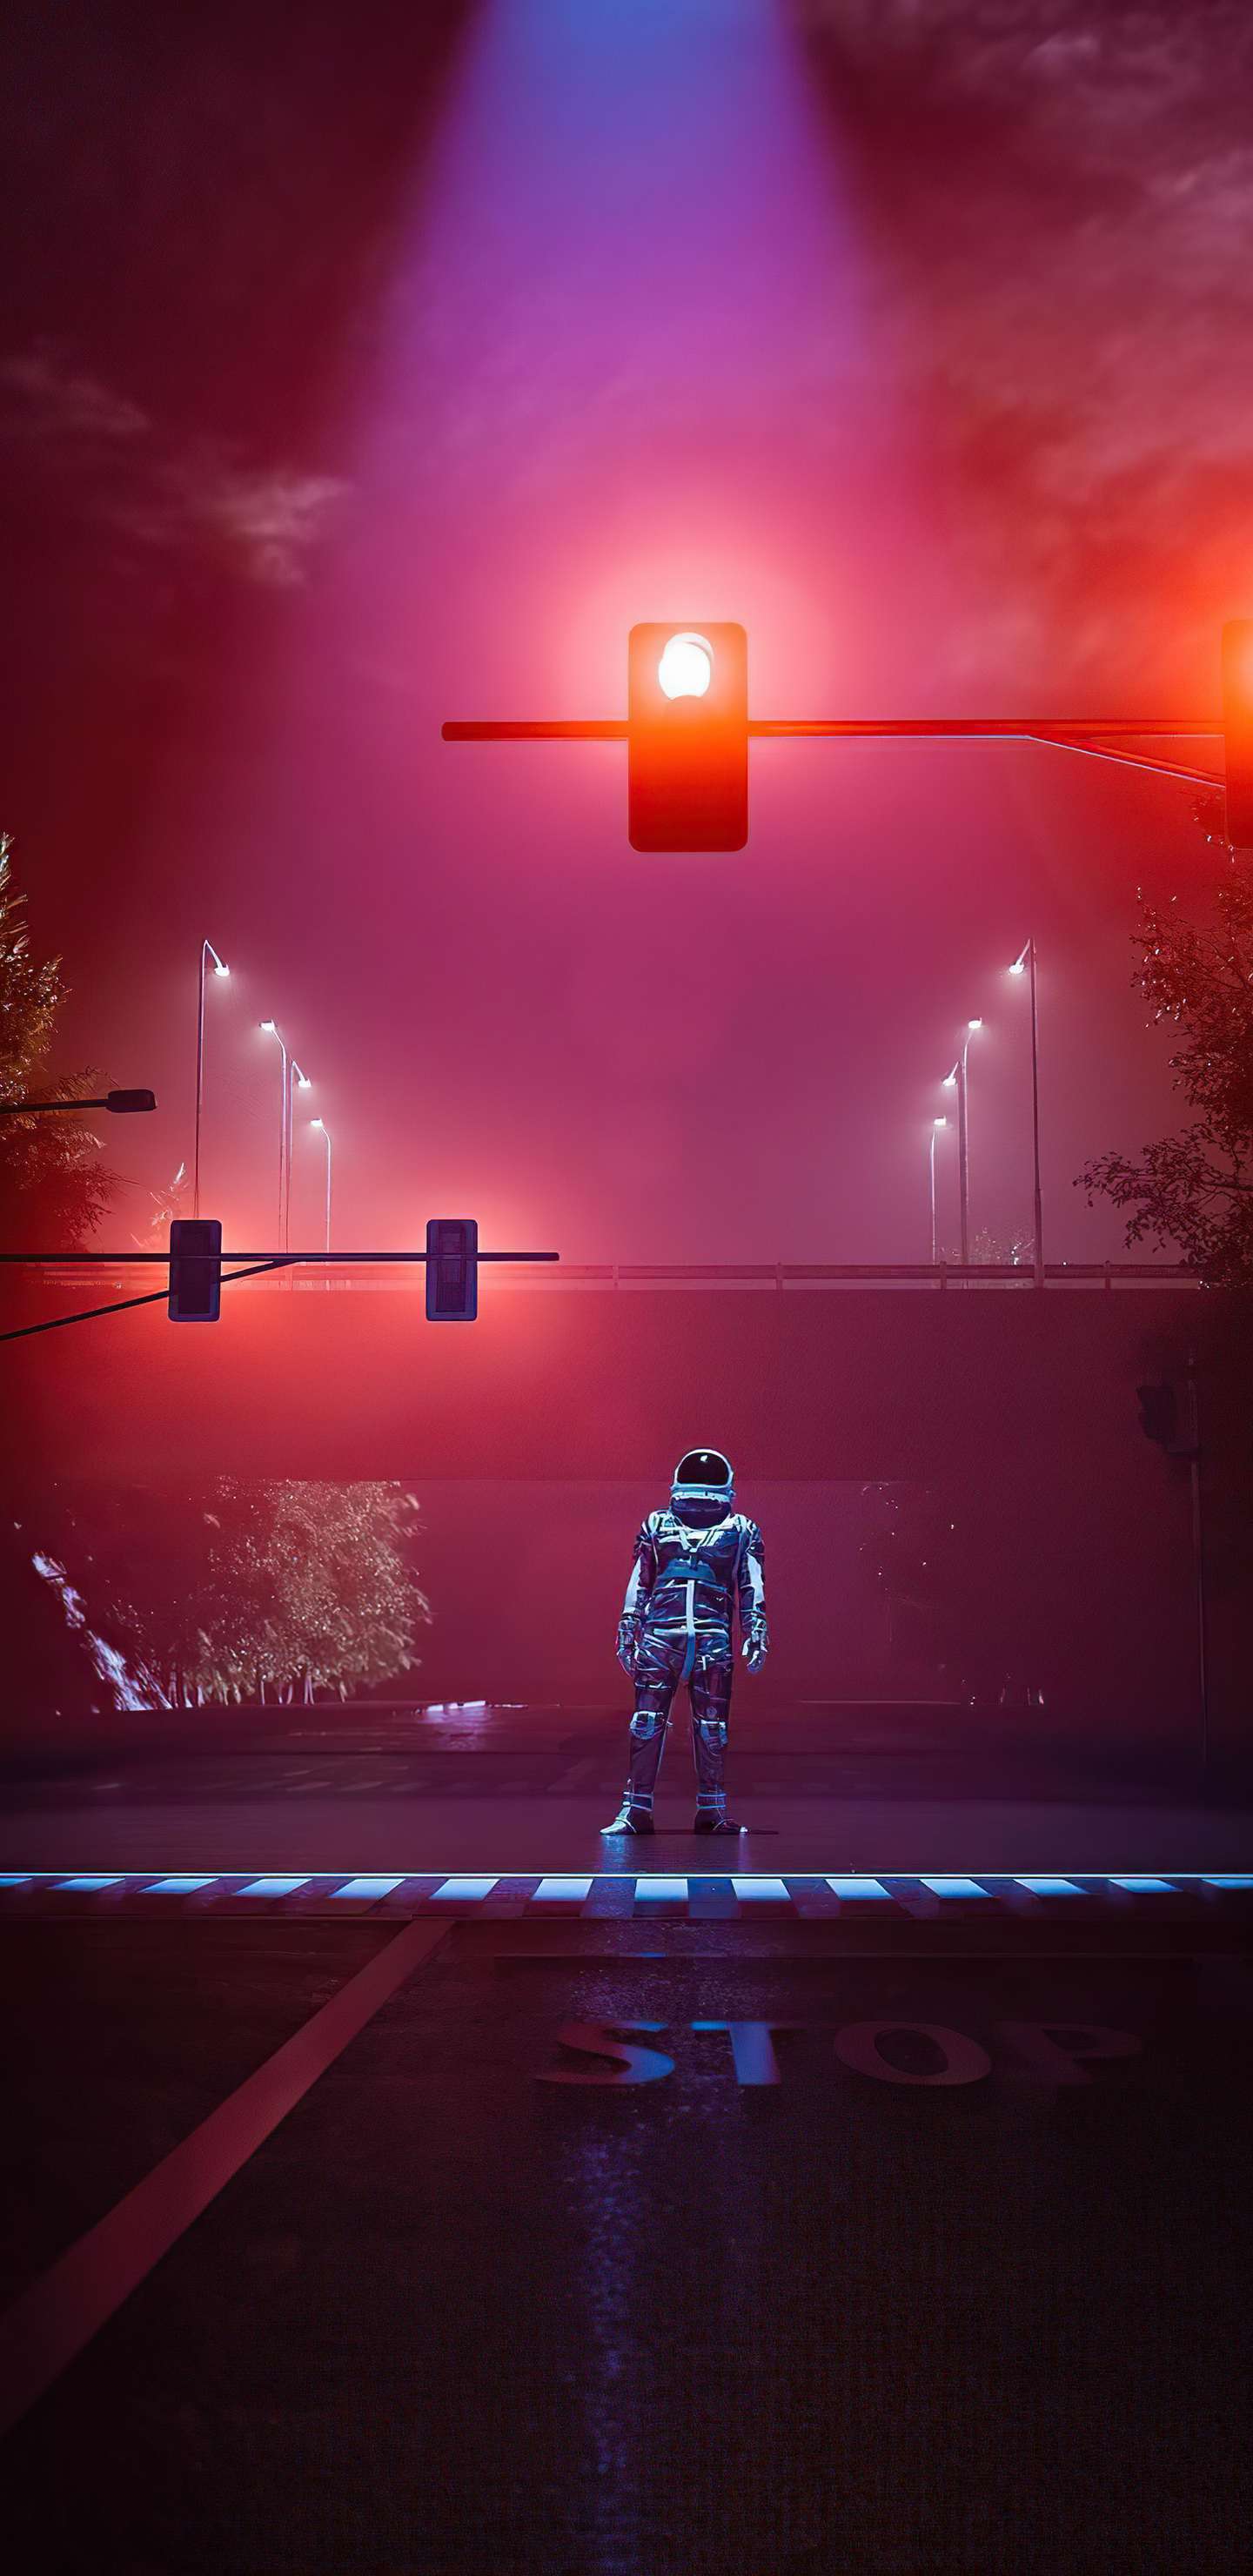 astronaut-at-stop-light-4k-k7.jpg